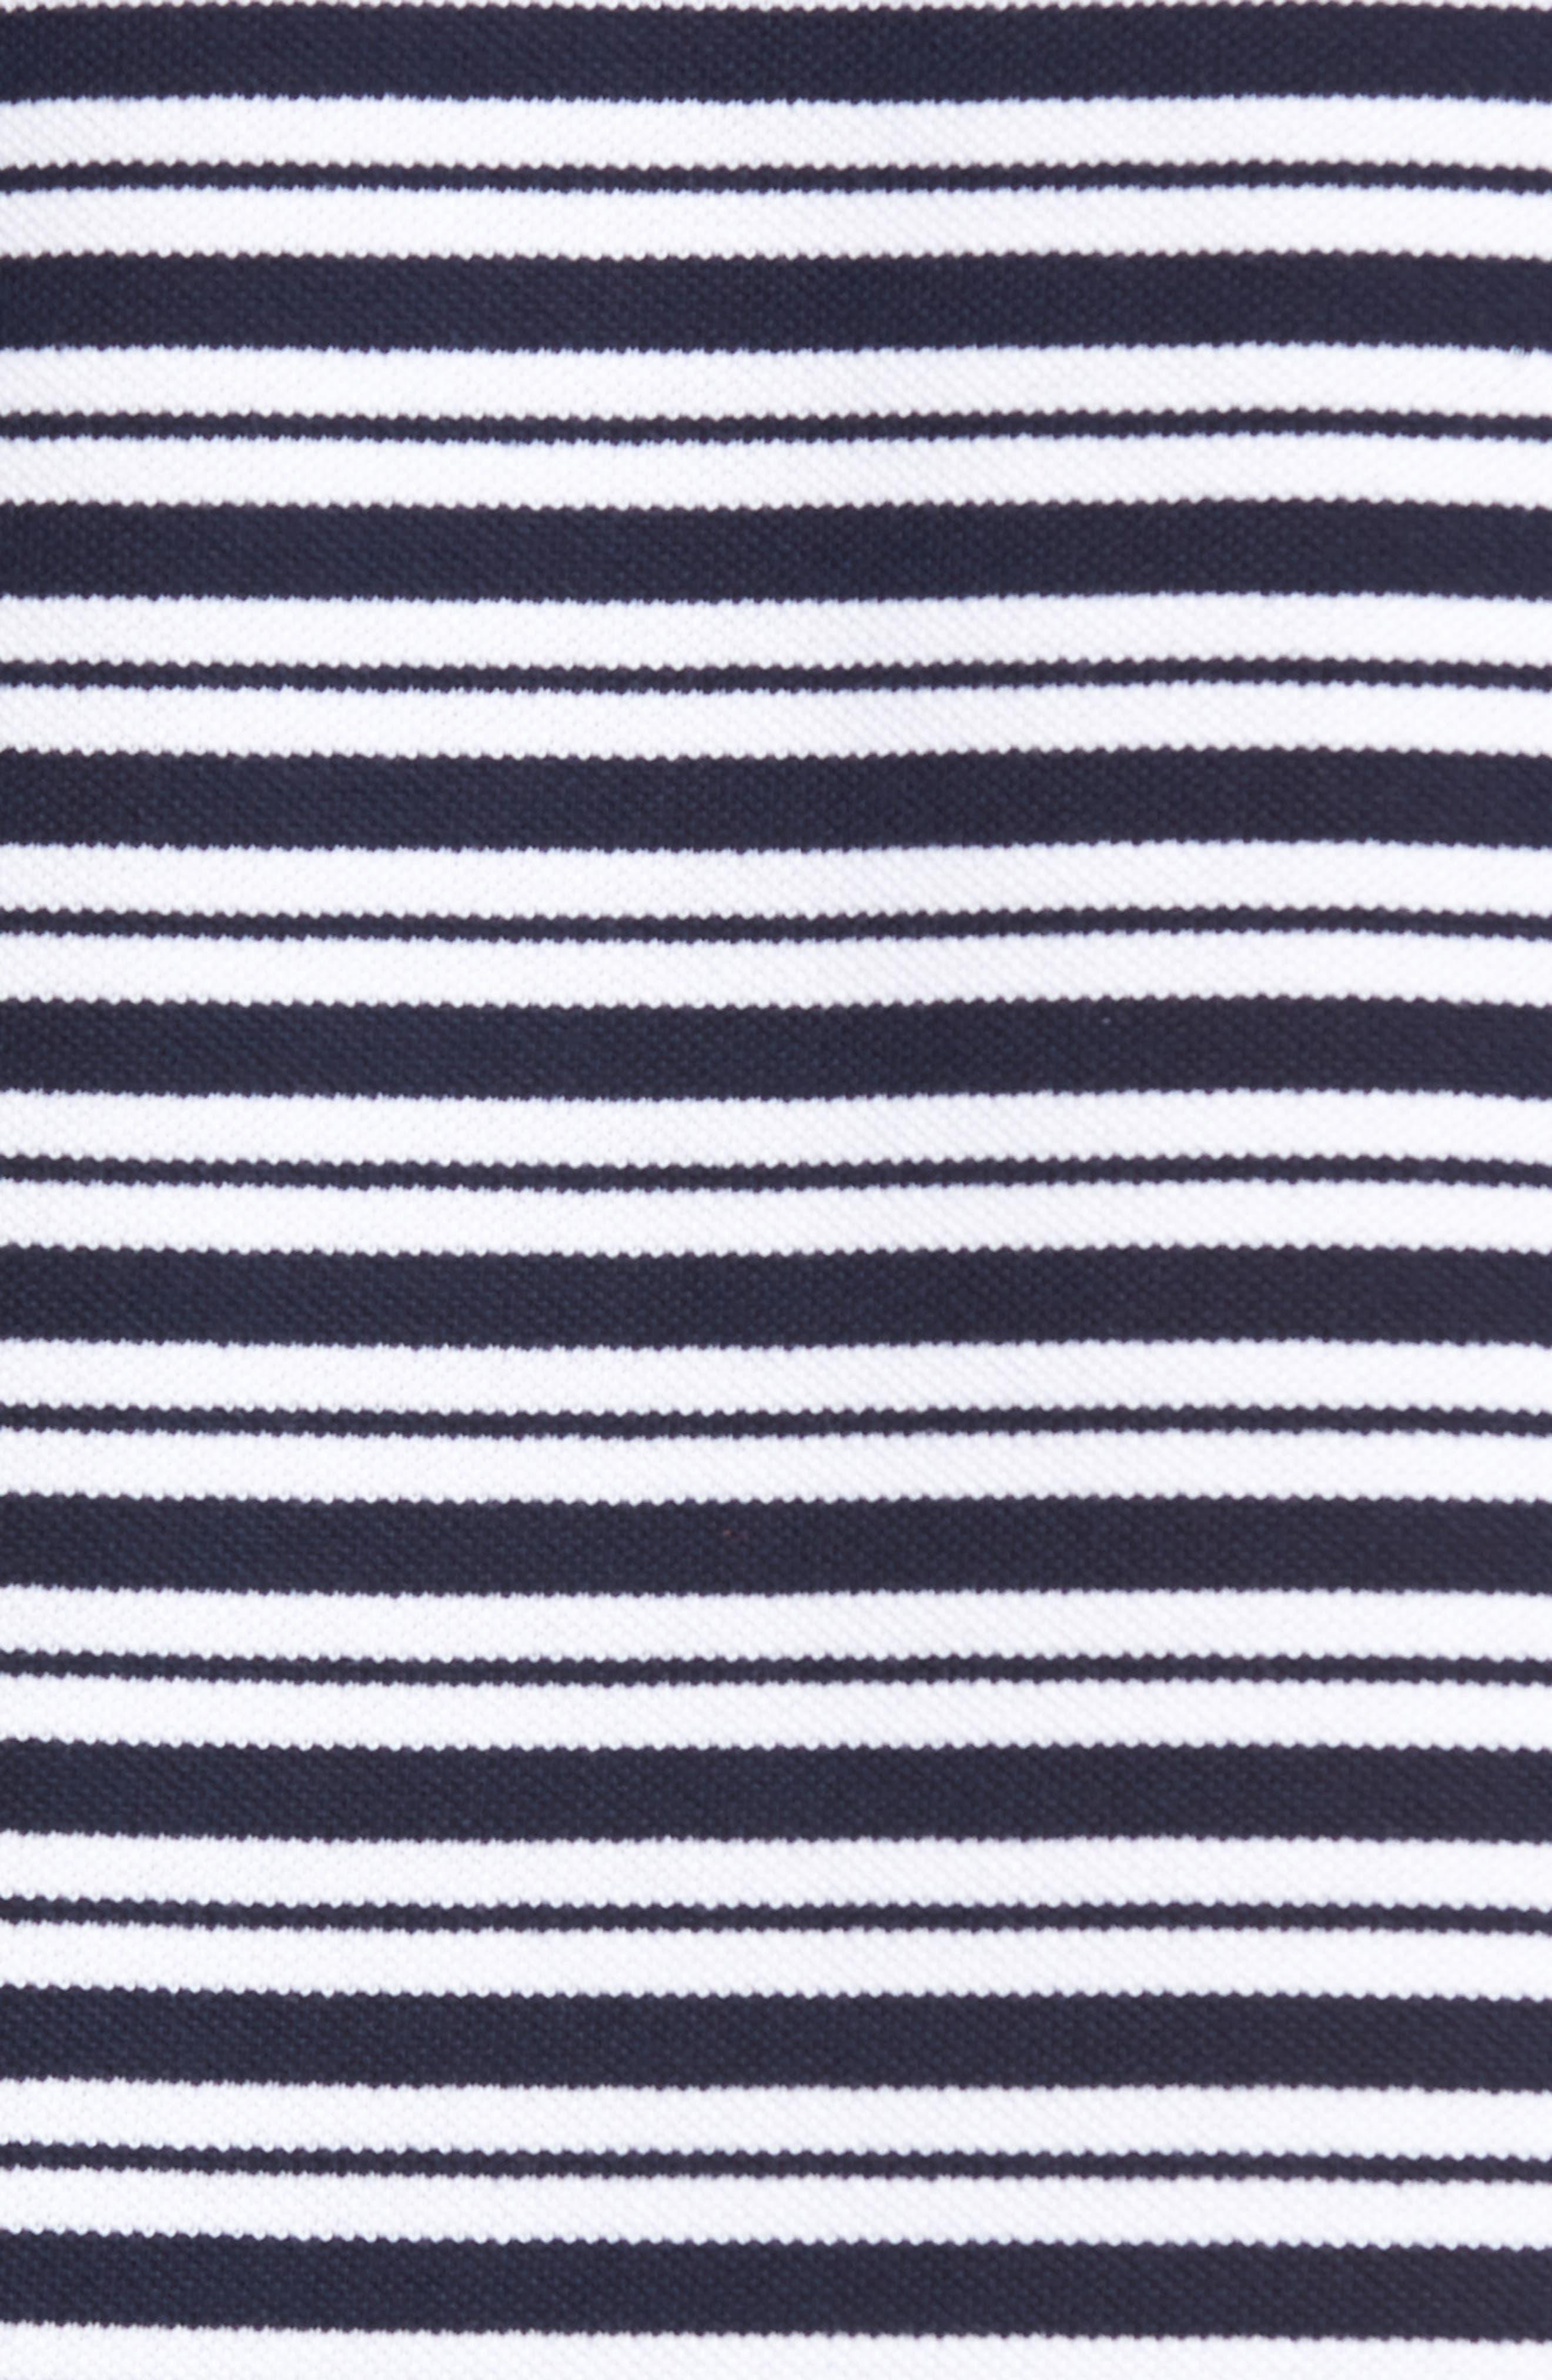 Striped Polo,                             Alternate thumbnail 5, color,                             Navy Blue/ White